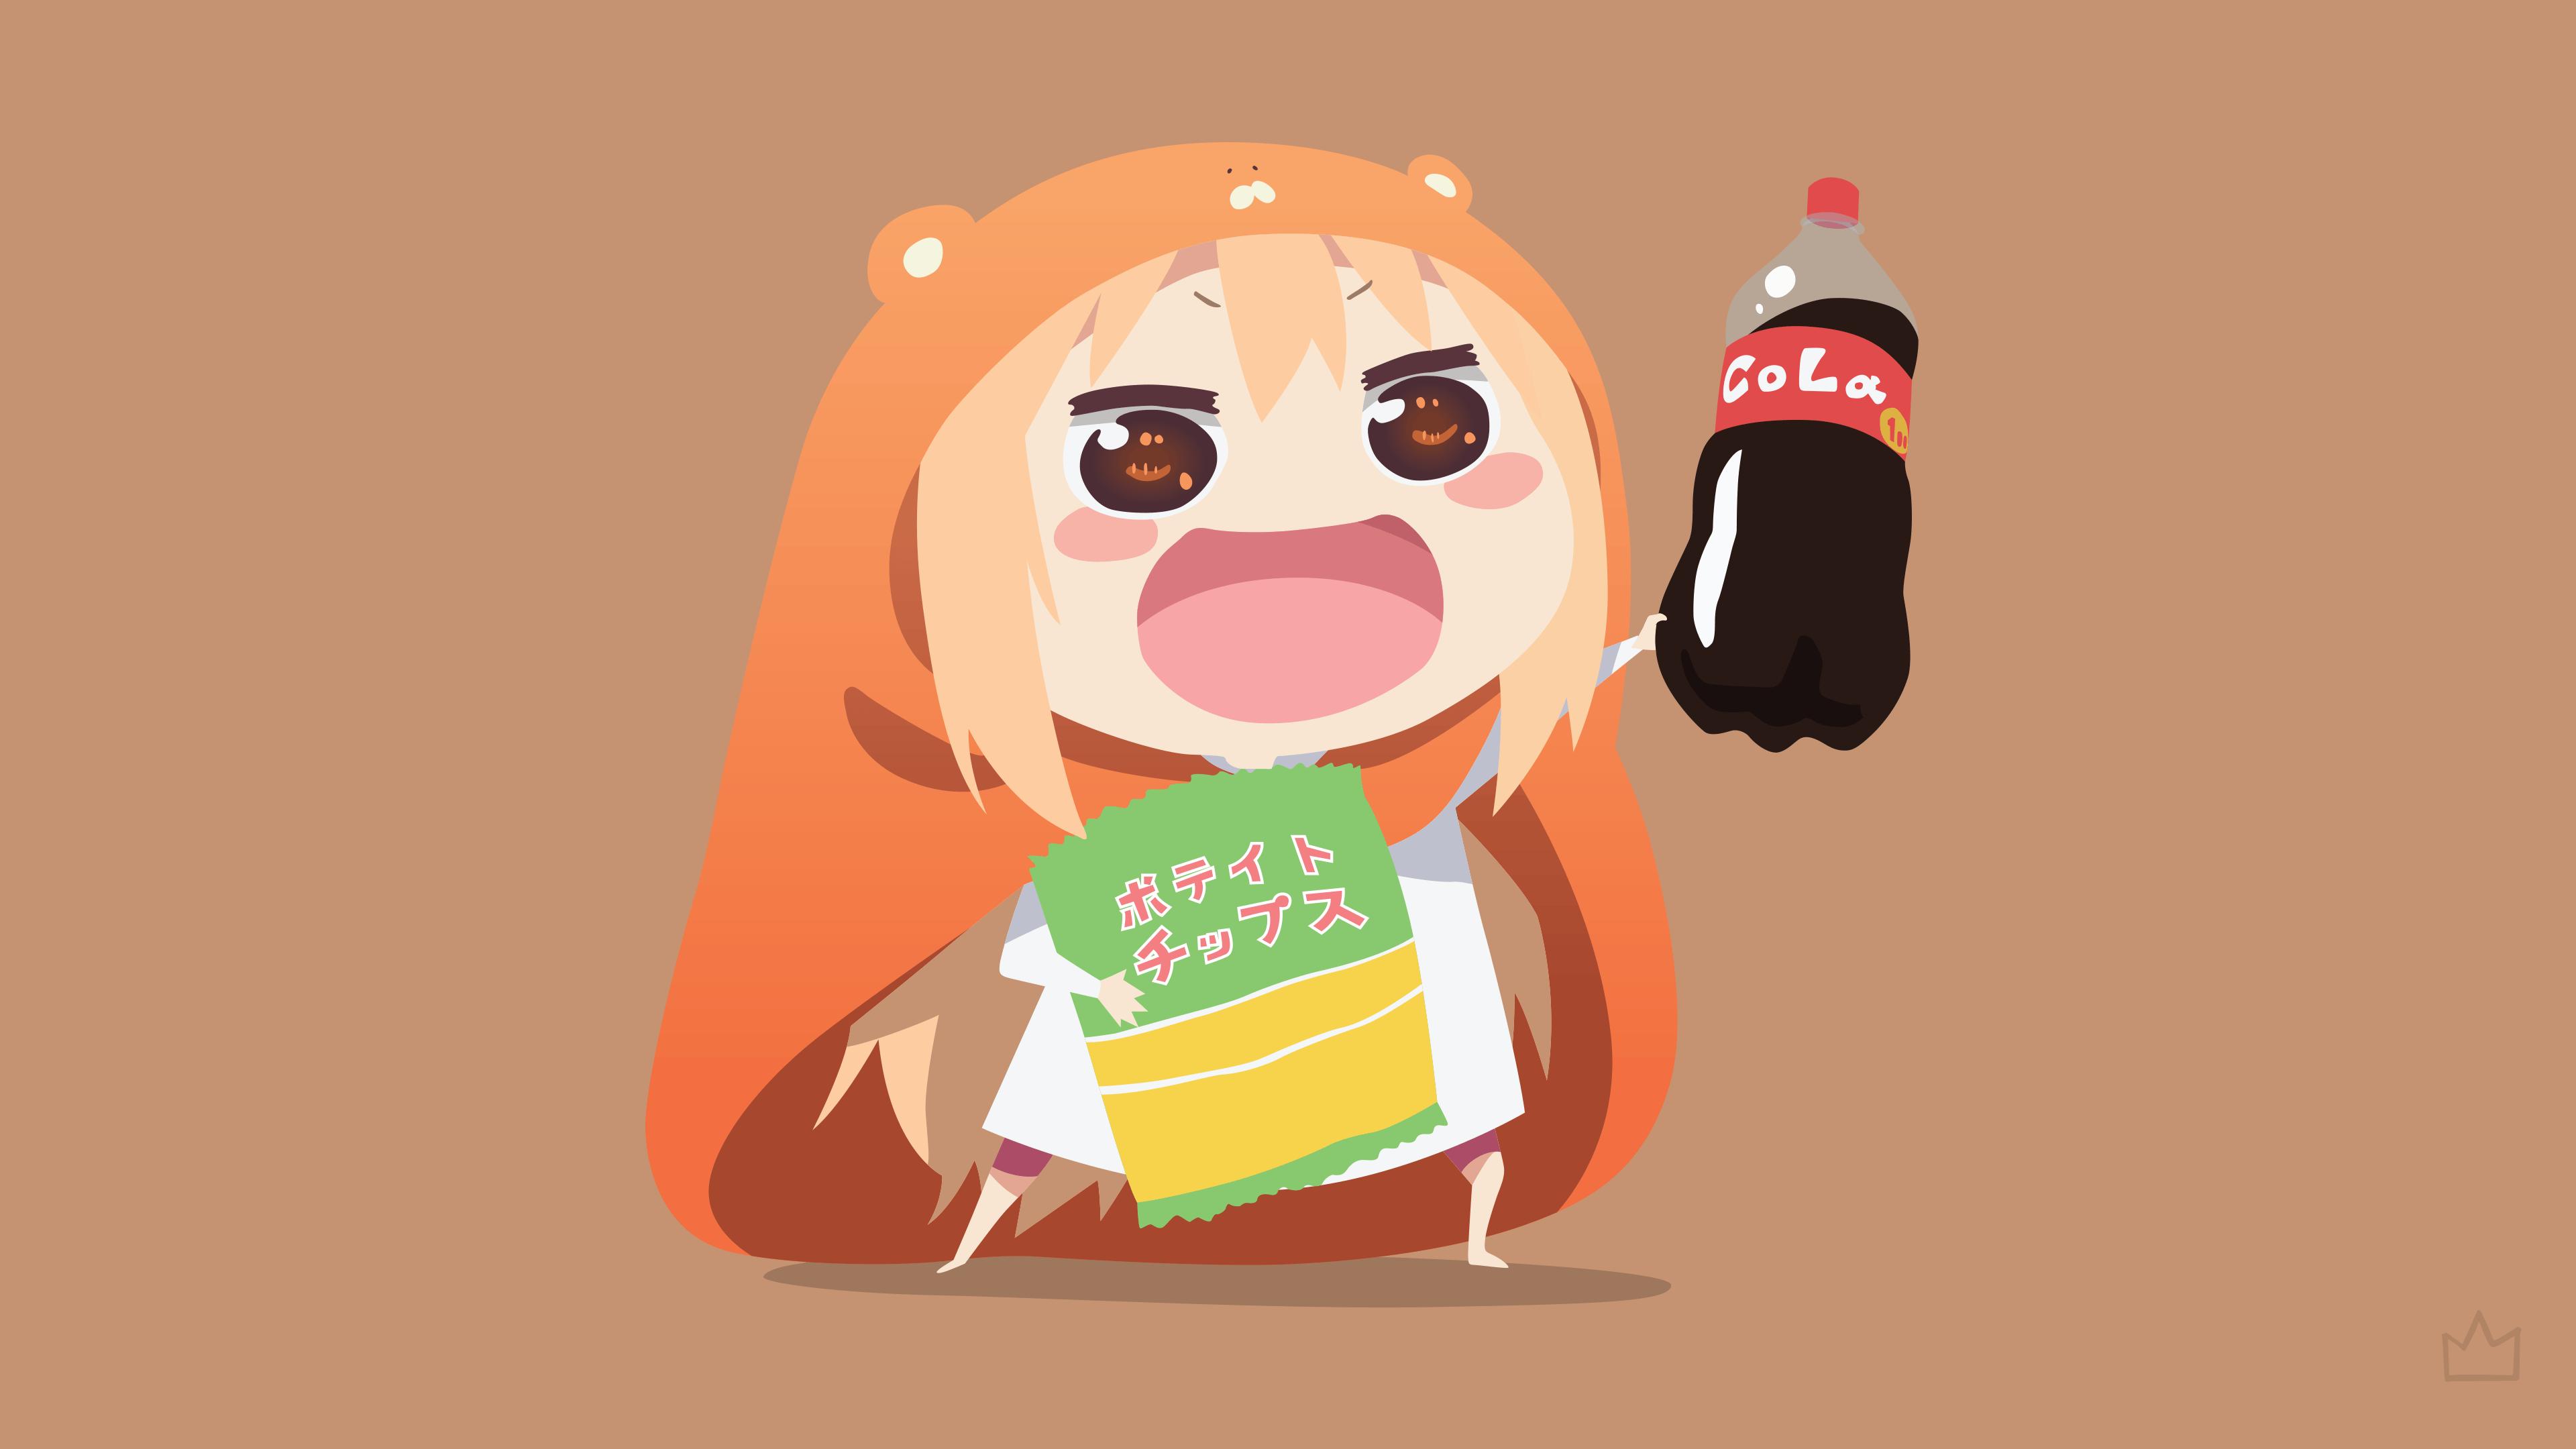 101 Gambar Anime Lucu Chibi Kekinian